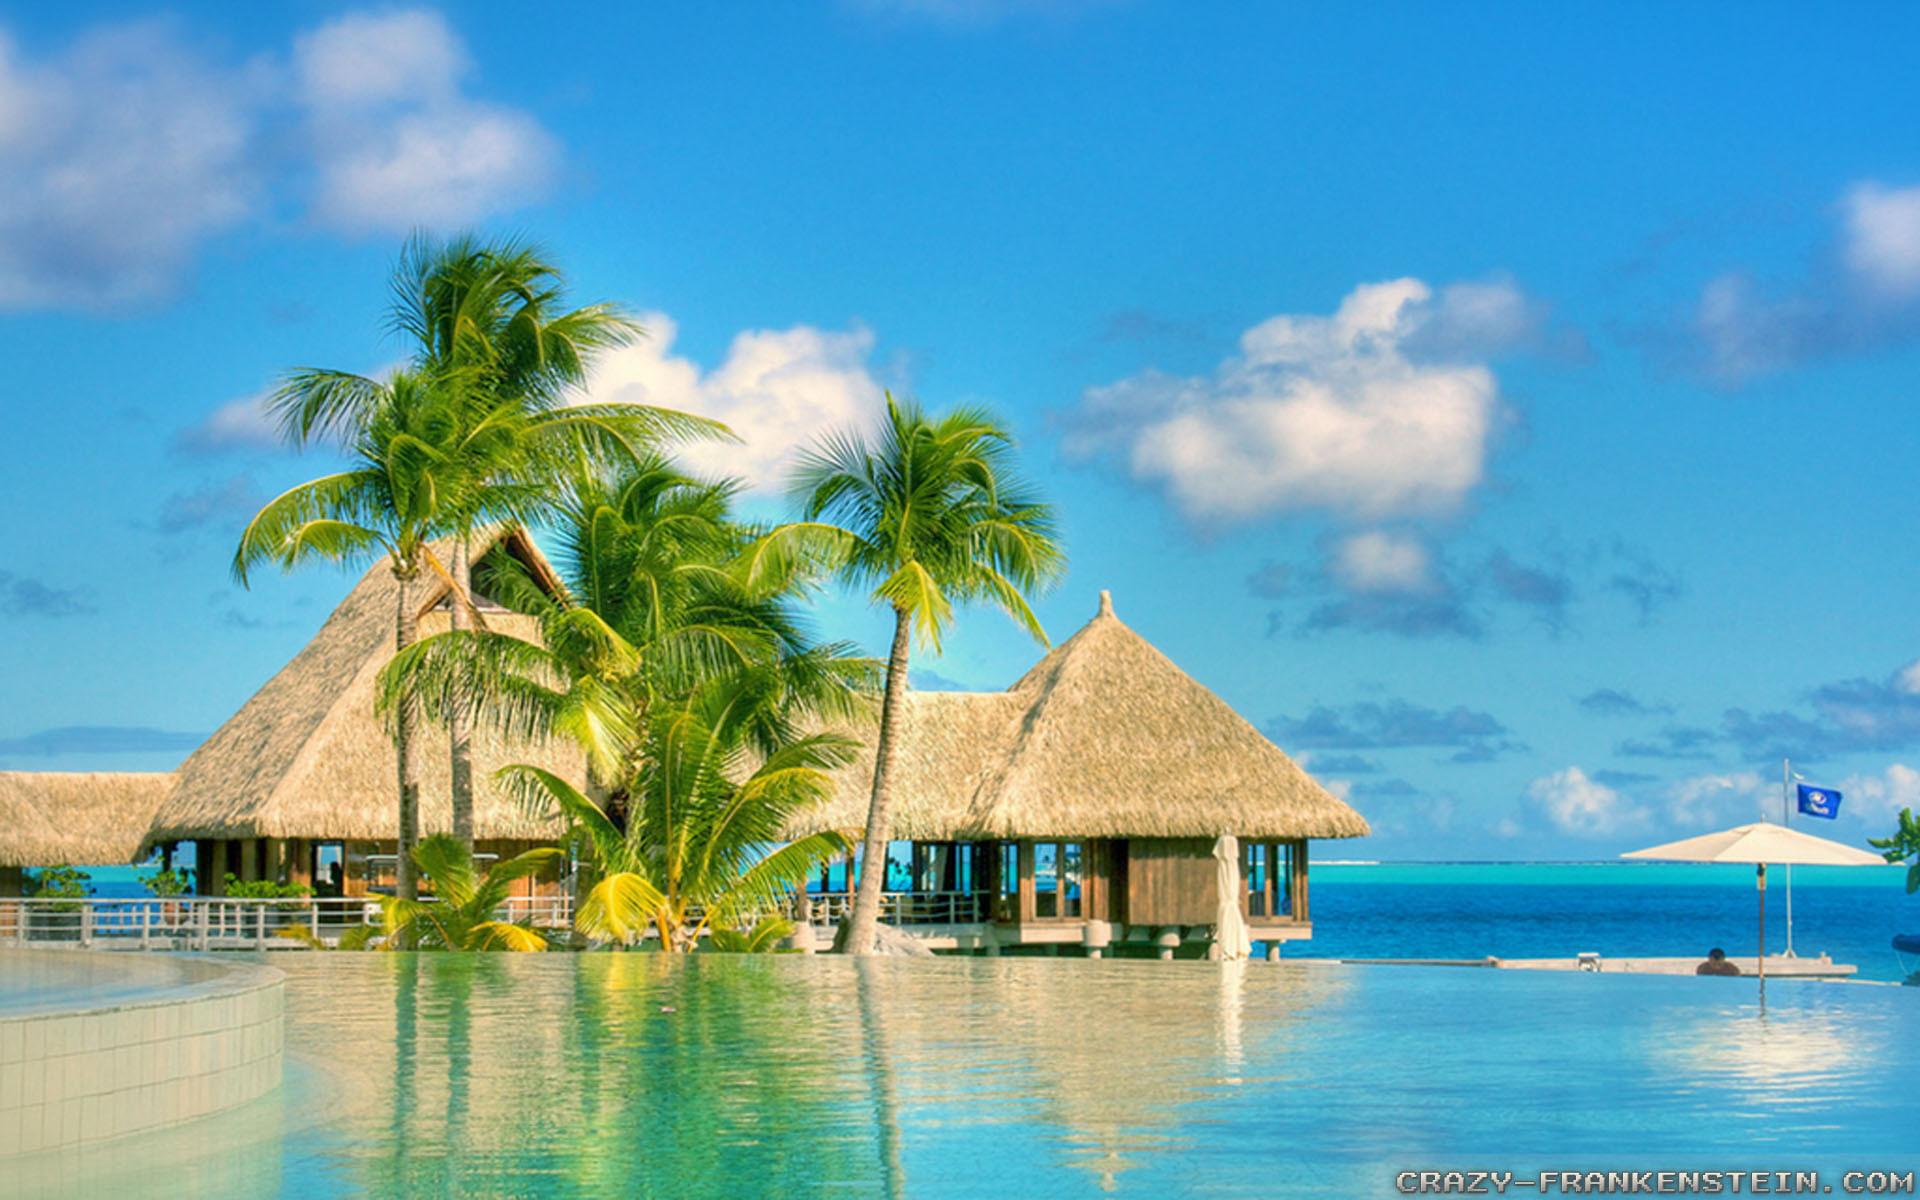 Beautiful Summer Screensavers. 1920×1200. Seascape Wallpaper 29203